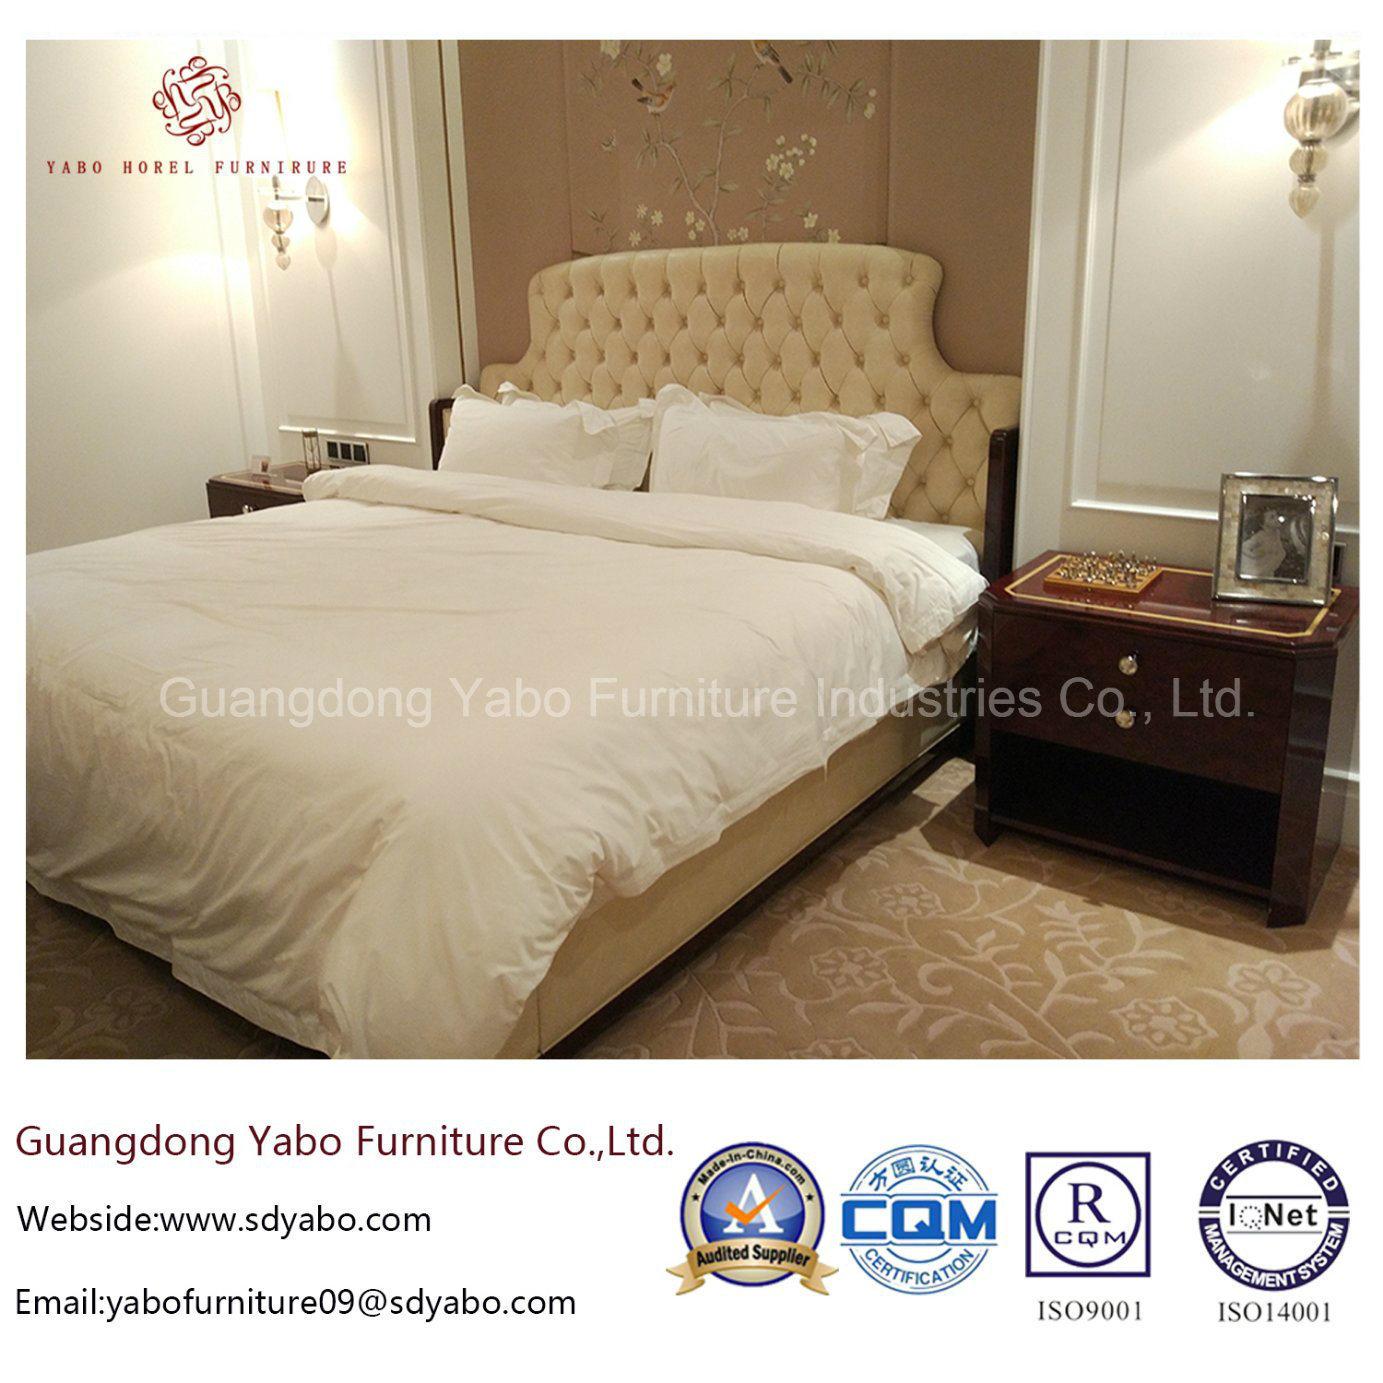 Fantanstic Hotel Furniture with Modern Bedroom Set (YB-O-71)